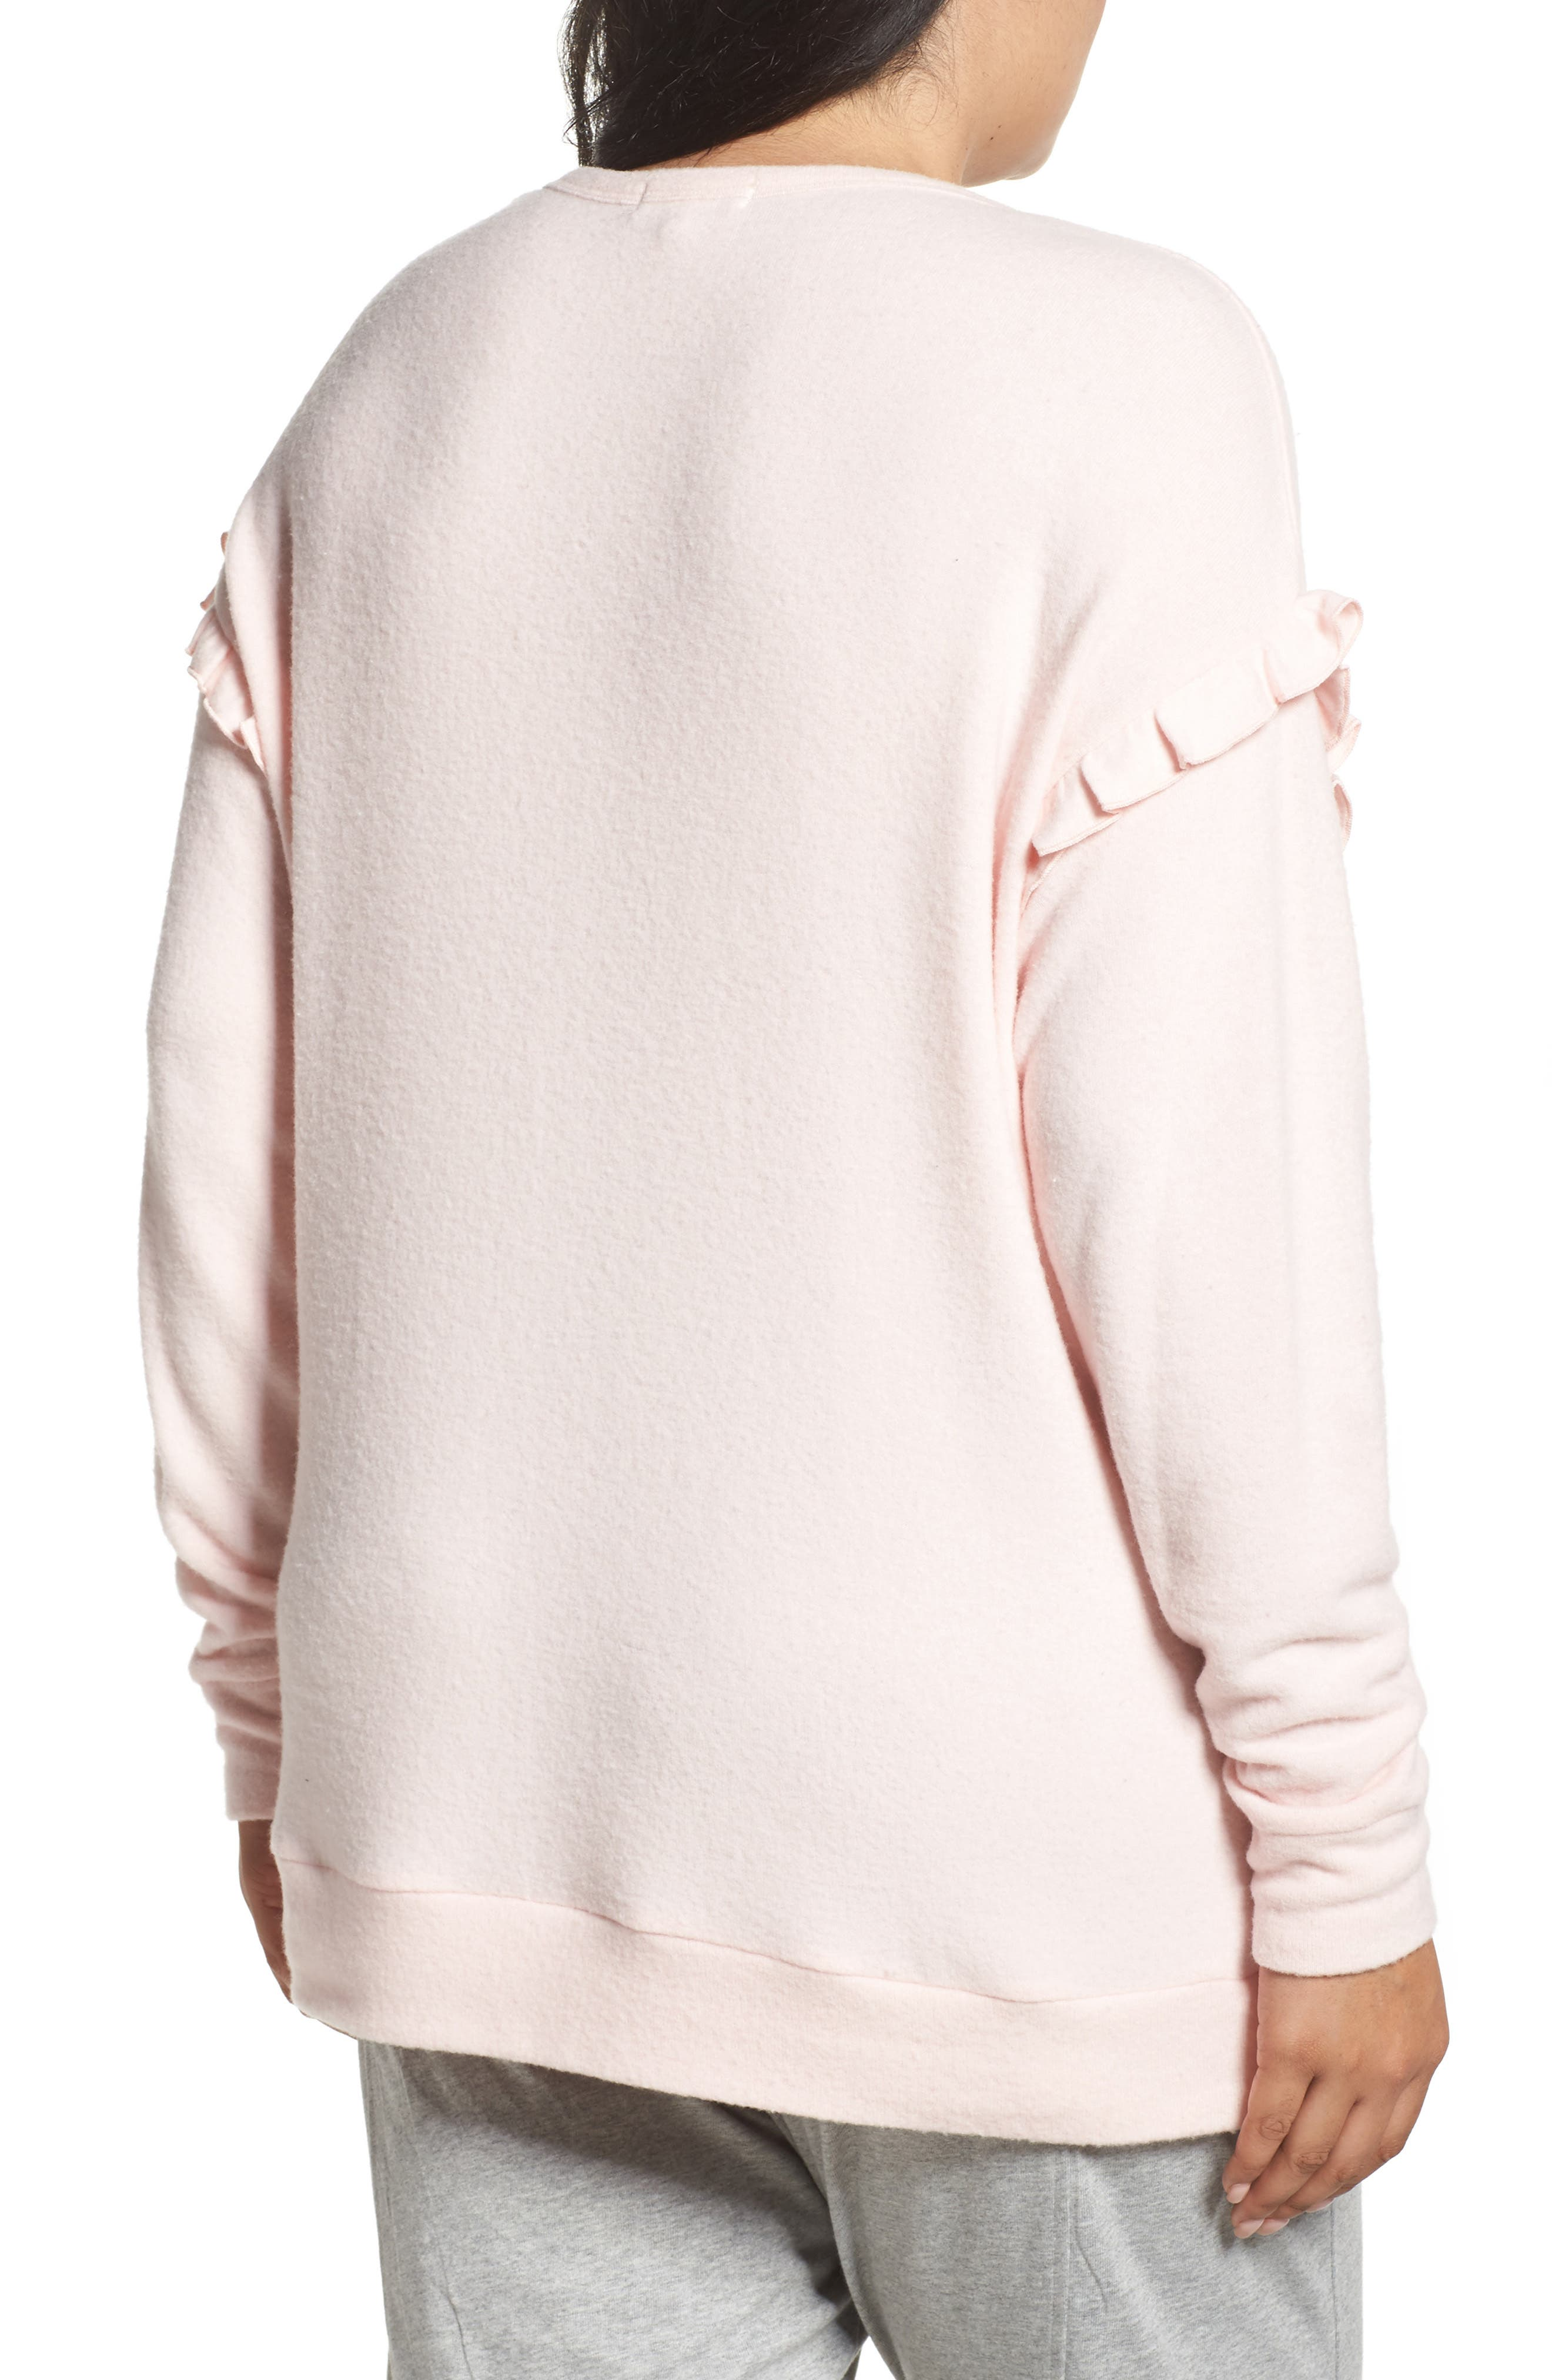 Alternate Image 2  - PJ Salvage Ruffled Peachy Jersey Crewneck Top (Plus Size)